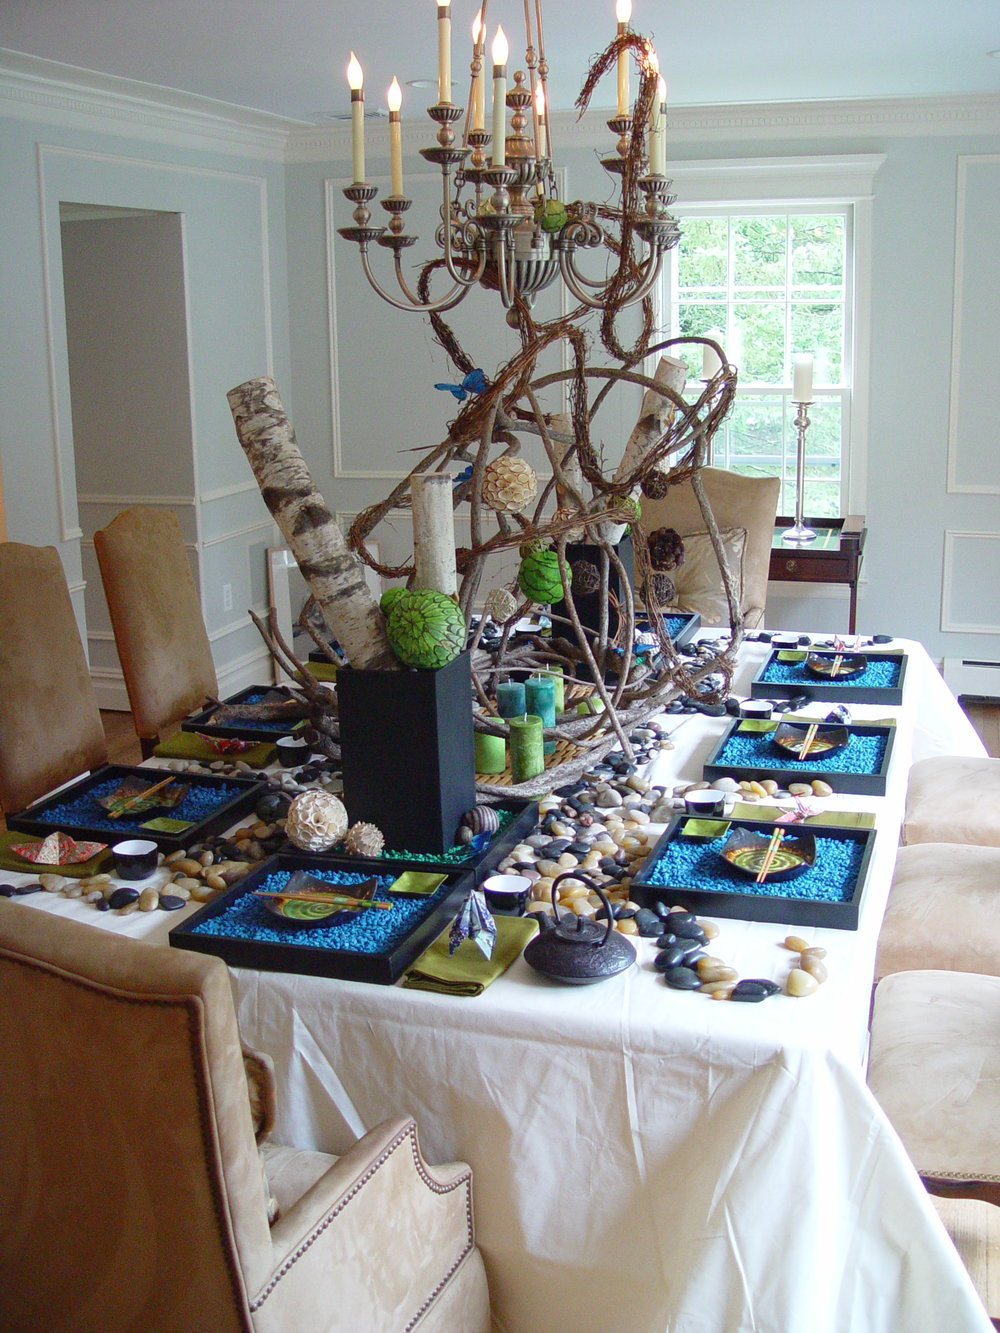 Centerpiece+rental+NJ+event+decor+design+props+rentals+NY+NYC+PA+eggsotic+events.jpg